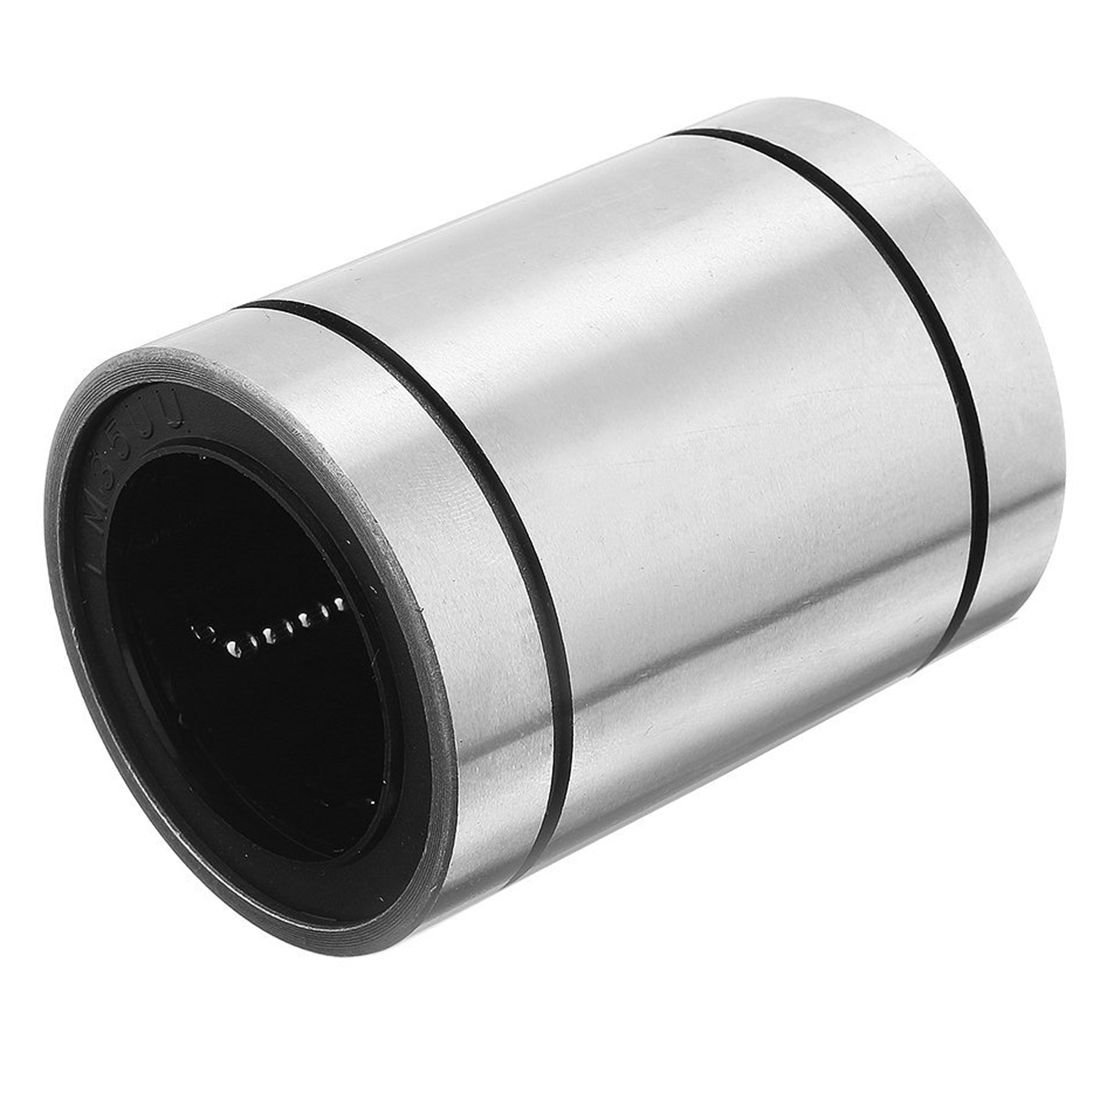 Nrpfell LM35UU 35mmx52mmx70mm Buje del rodamiento de bola del ...